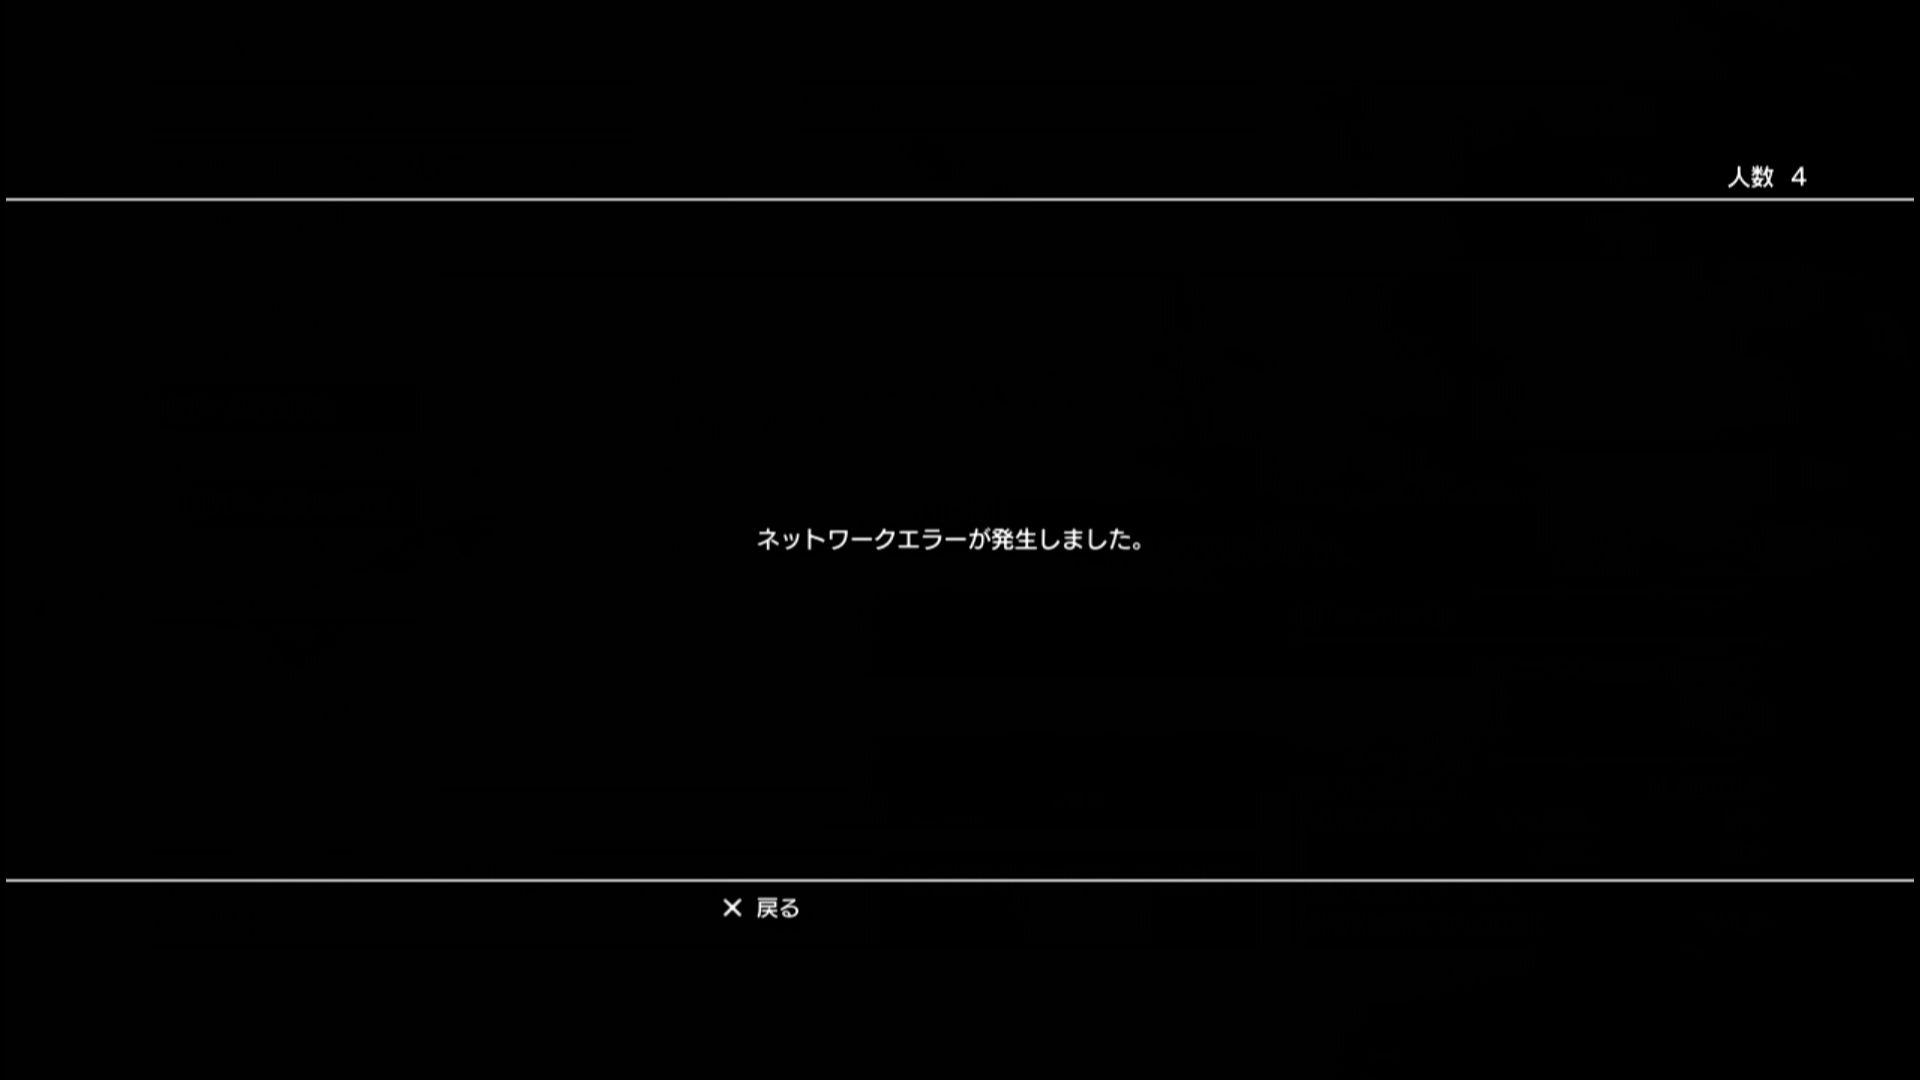 2015_11_6_1_30_15